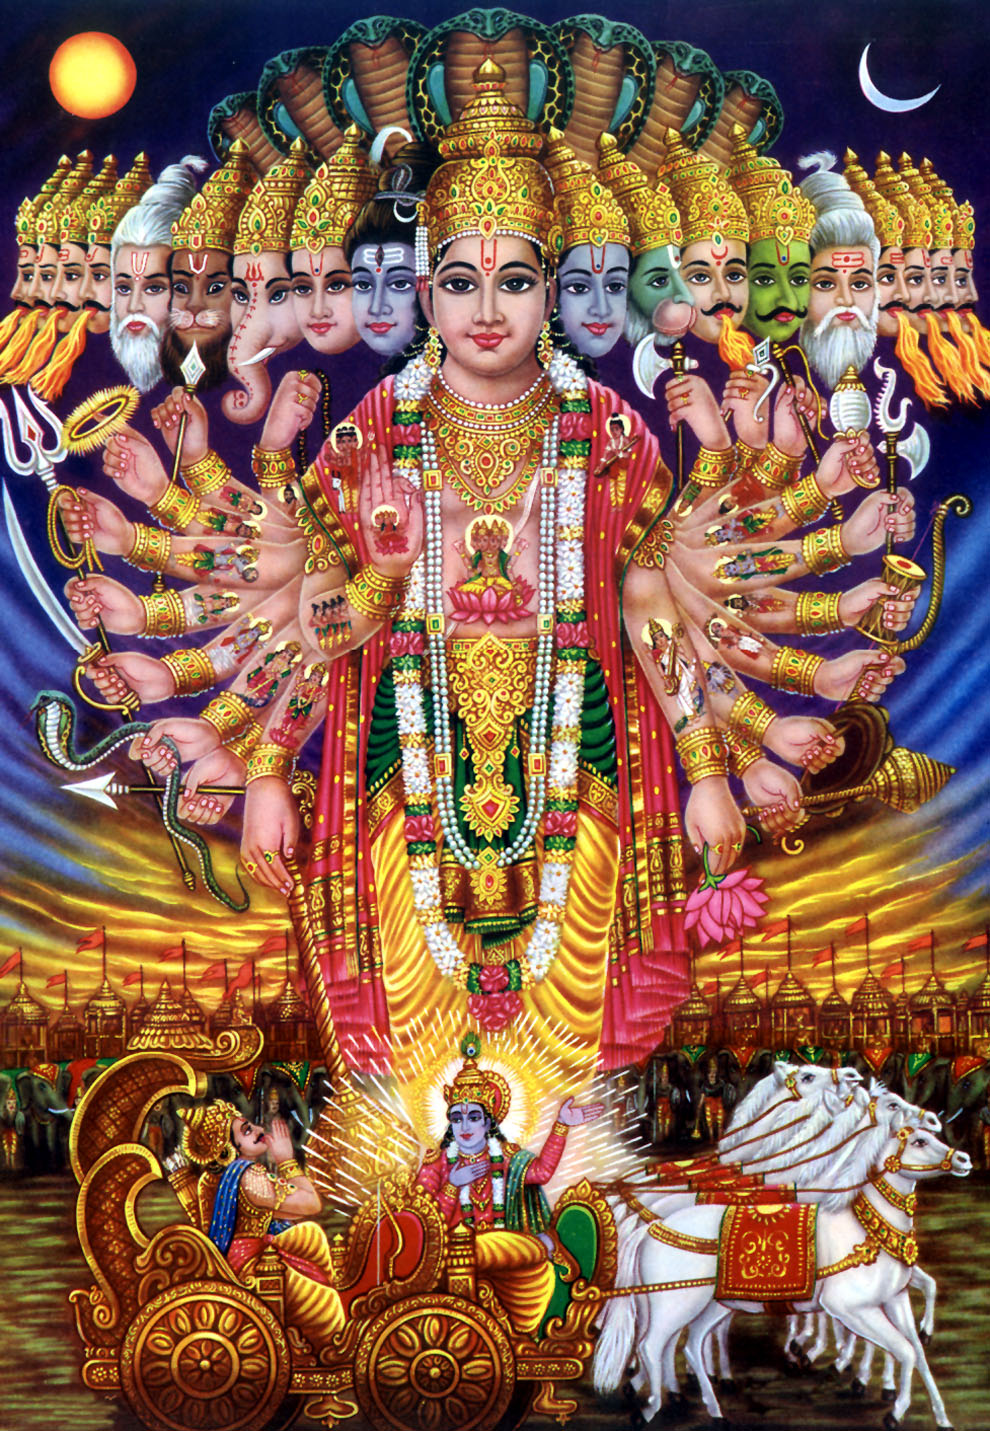 18 Captivating Photos Of Kids Dressed Up As Hindu Gods And ... |Indian Hindu Gods